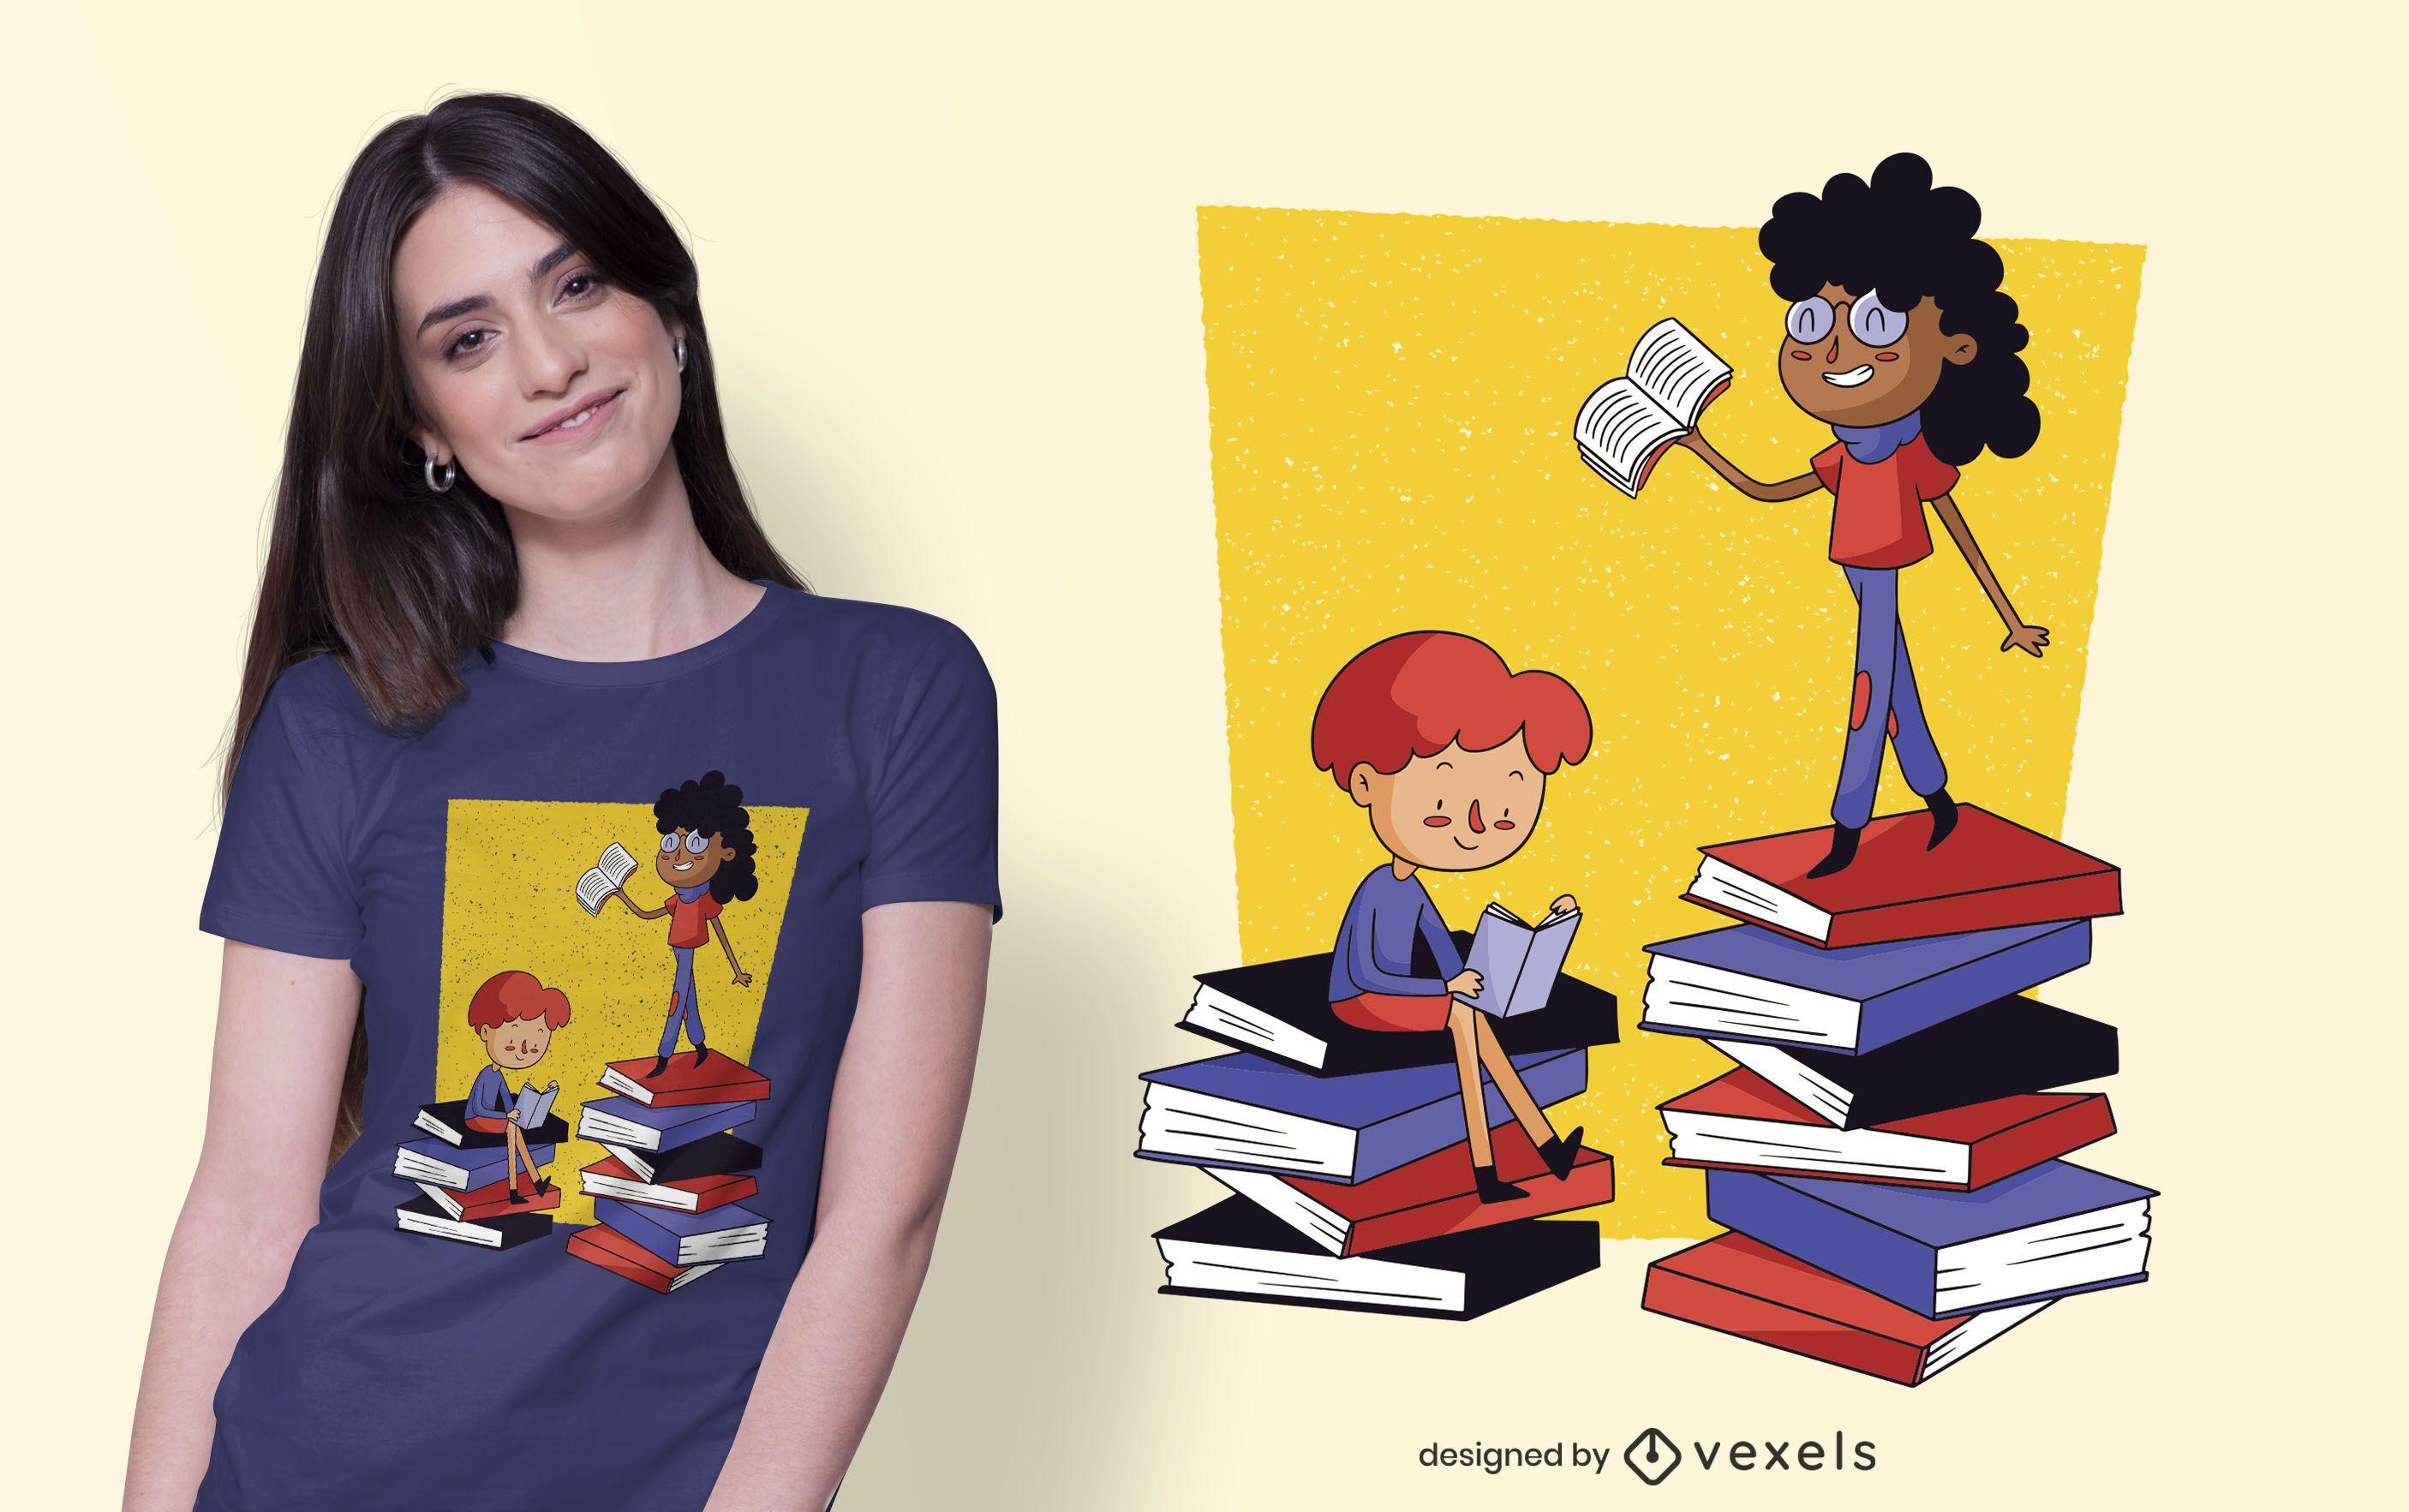 Kids and books t-shirt design